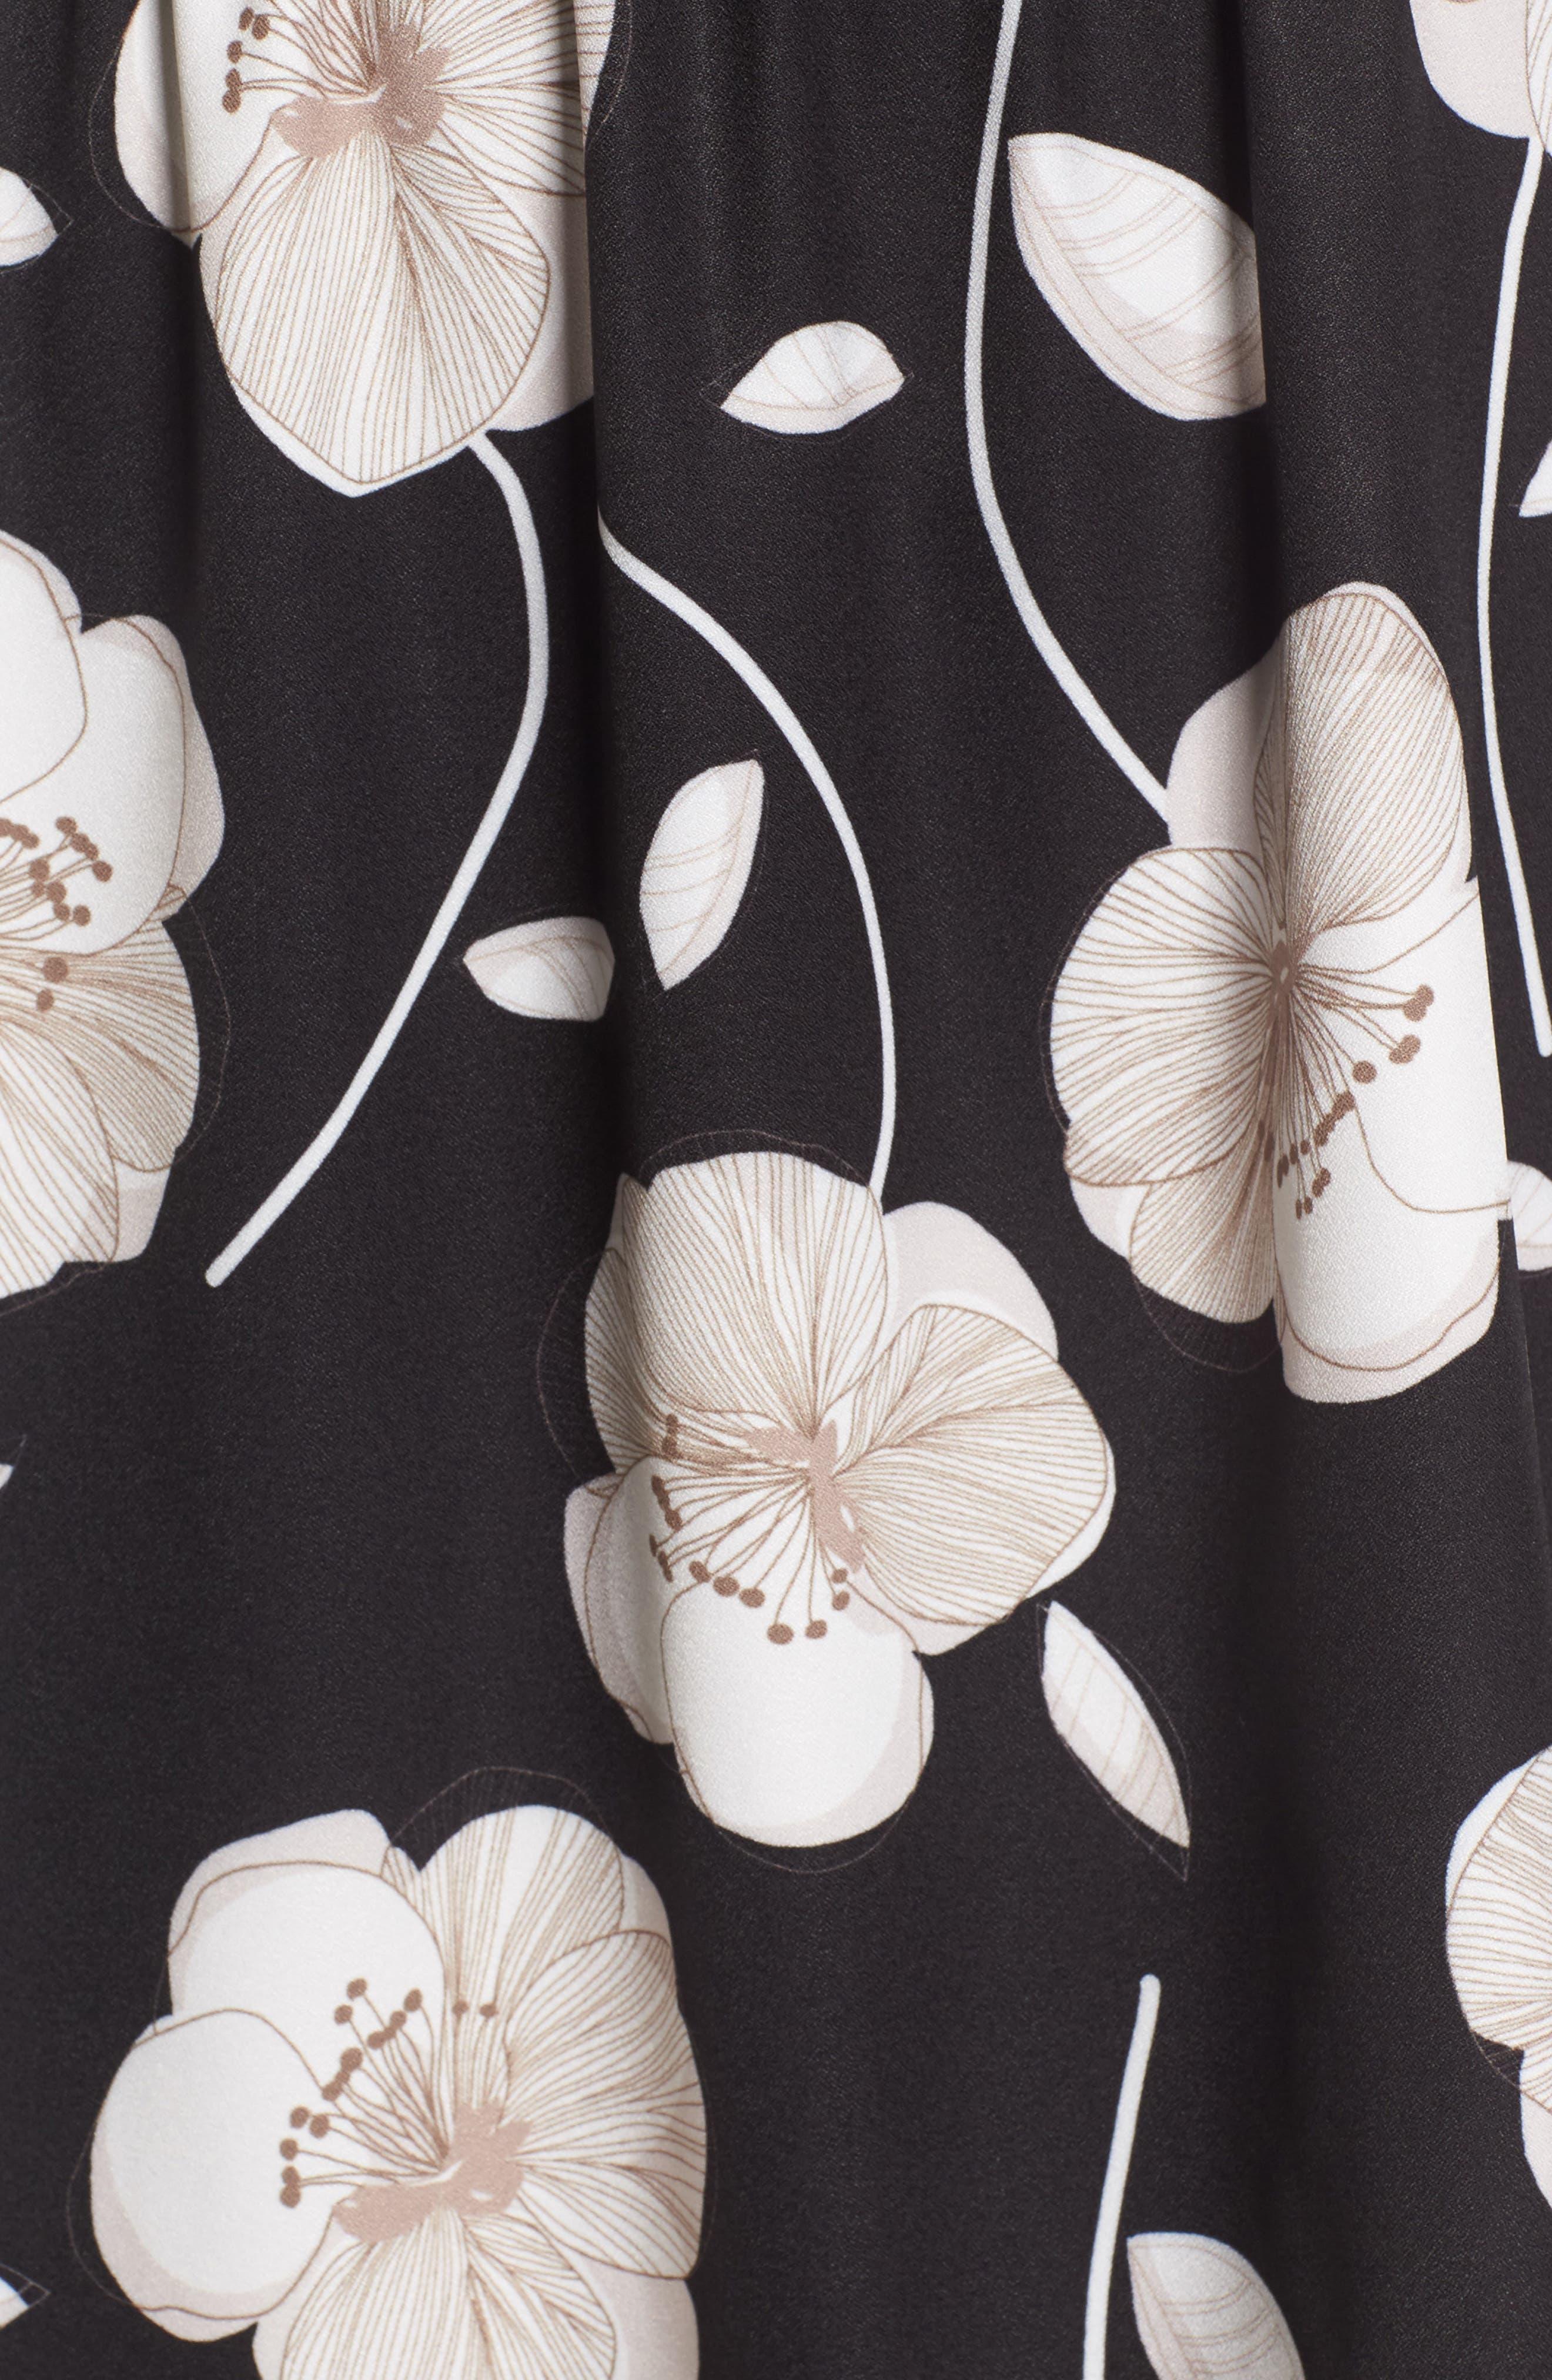 Cold Shoulder Asymmetrical Maxi Dress,                             Alternate thumbnail 5, color,                             Black